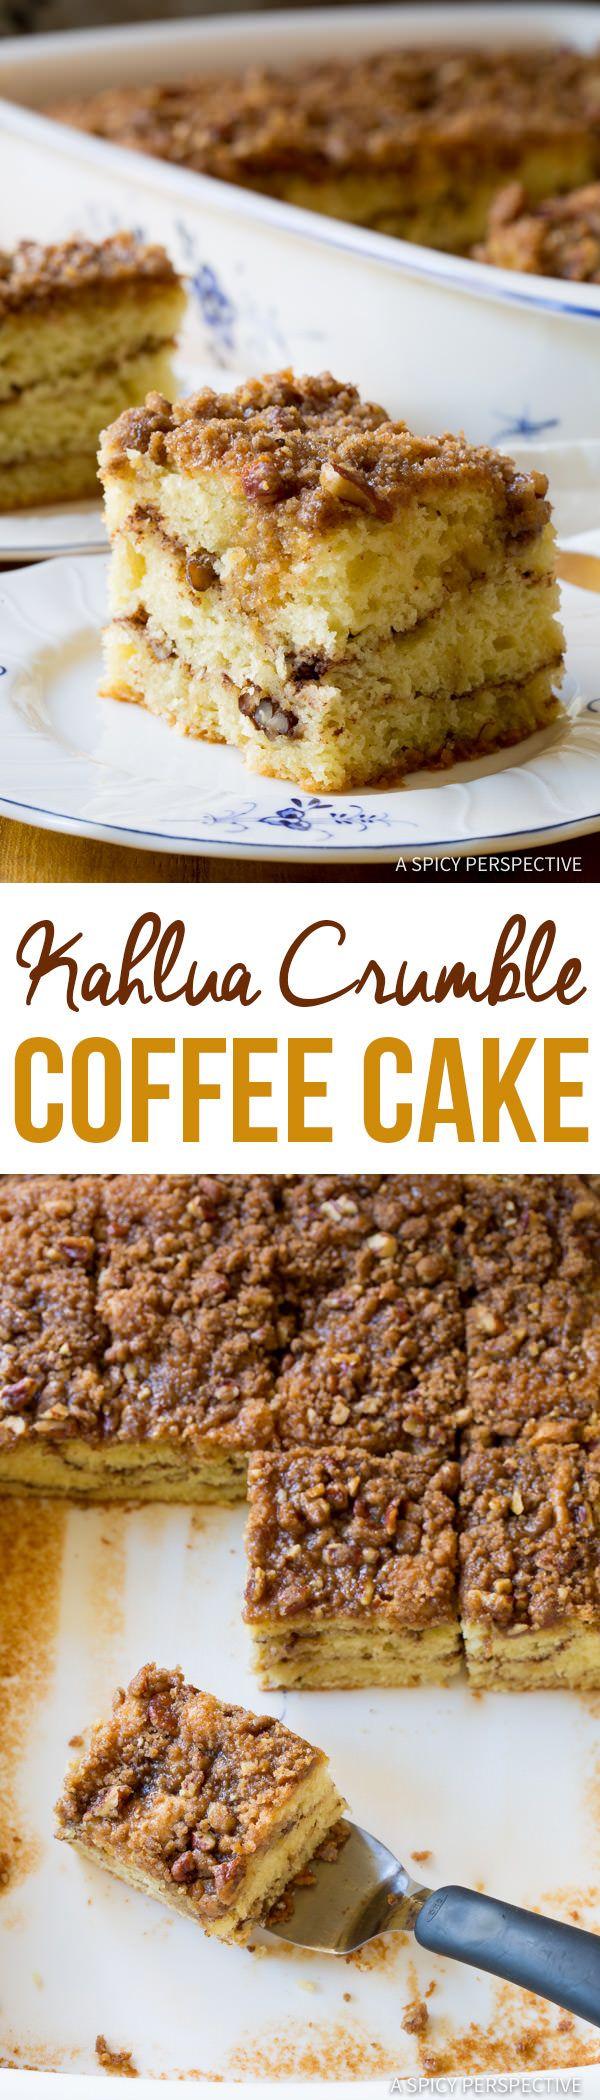 Tender Boozy Kahlua Coffee Cake Recipe | ASpicyPerspective.com